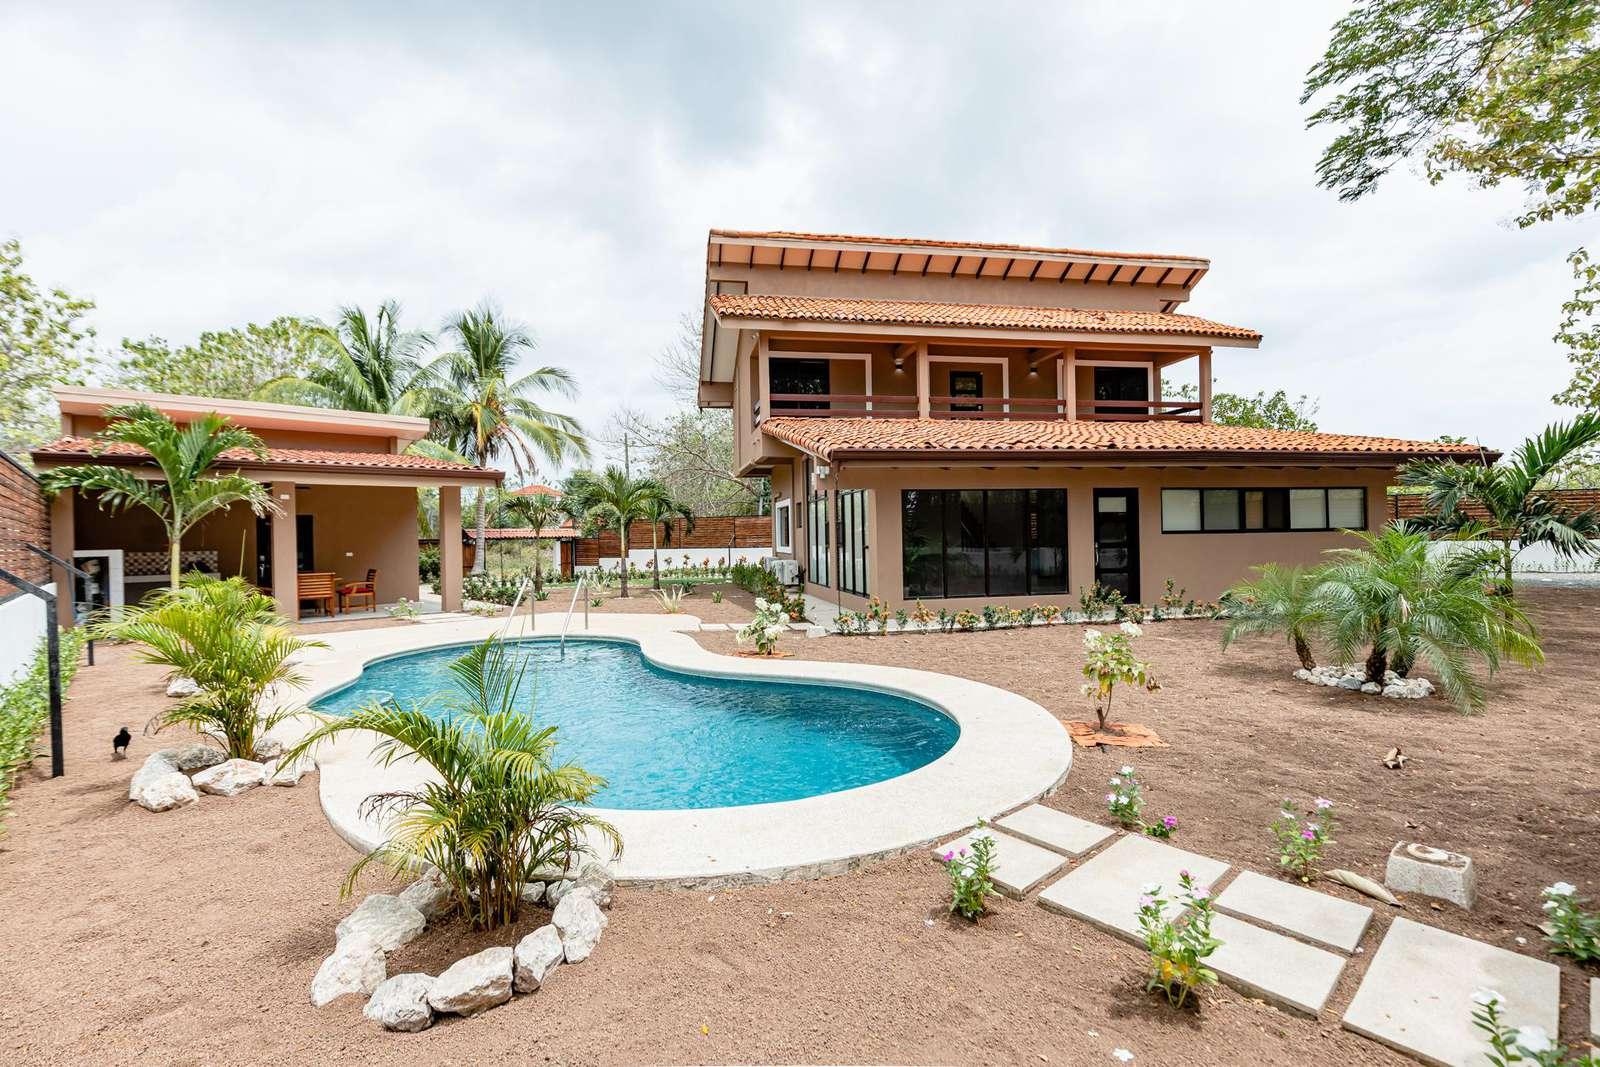 Pool- Main Hose- Dechated Apartment